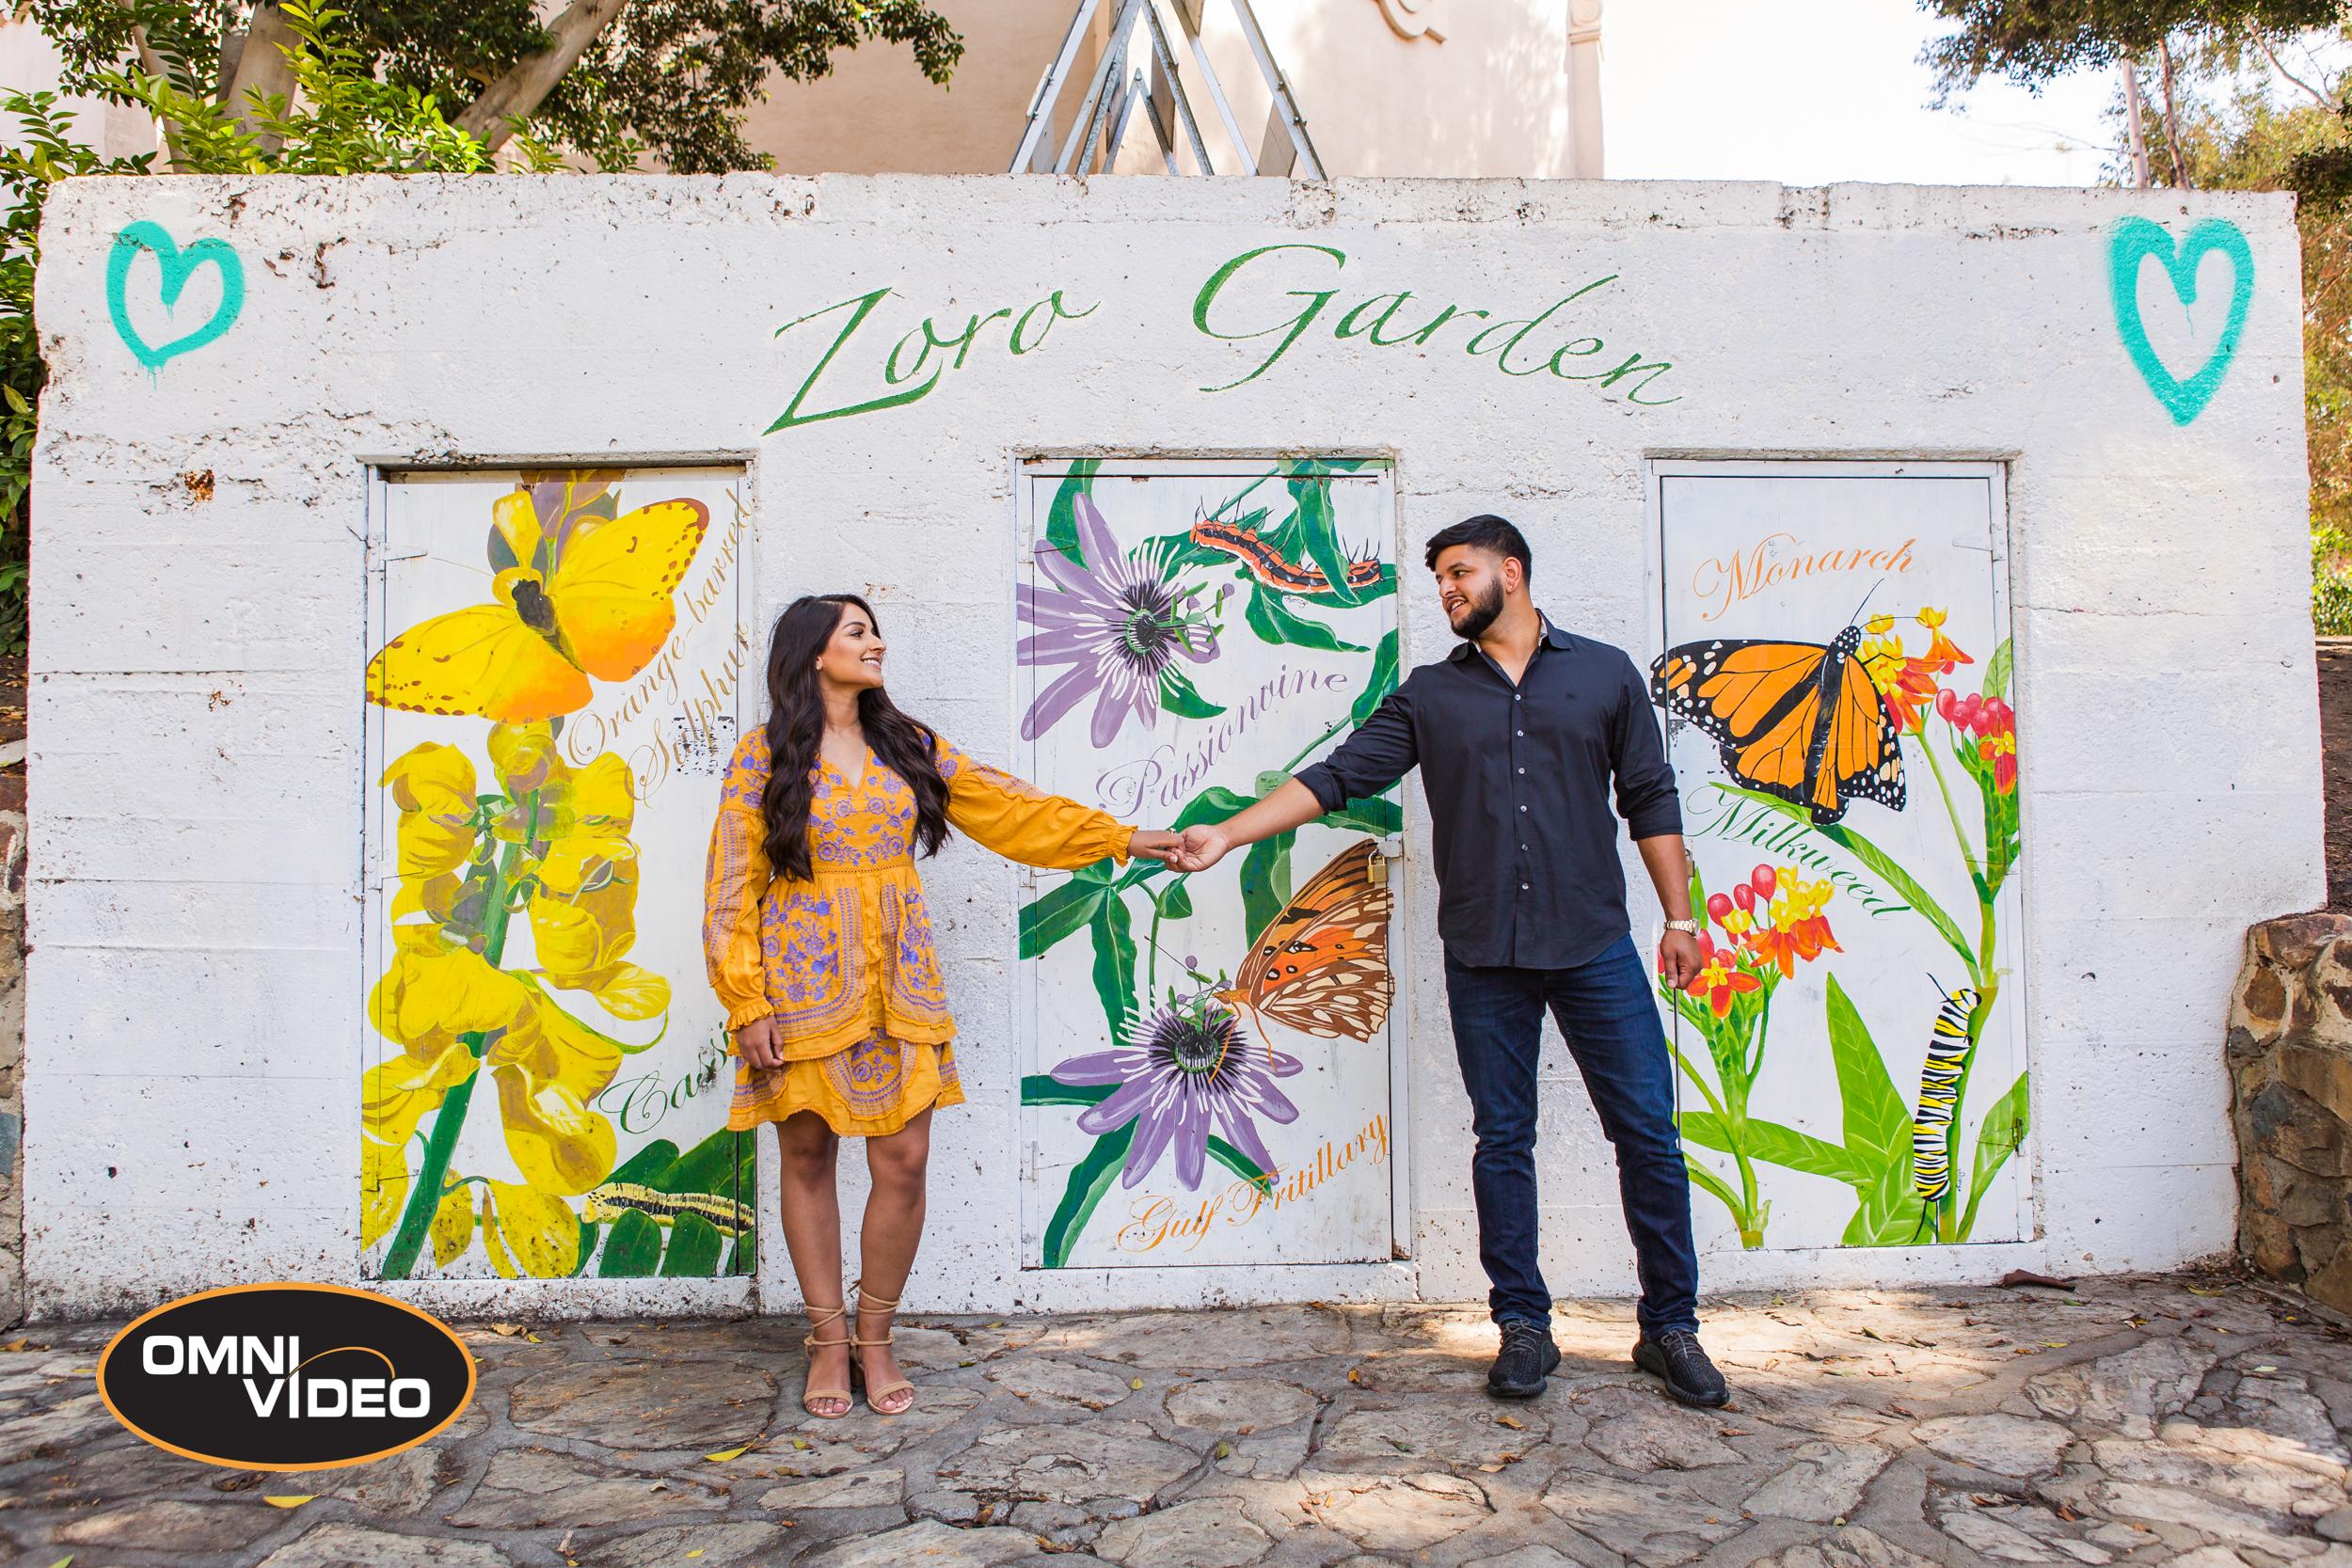 Yad & Raji's Engagement Photoshoot - Omni Video USA